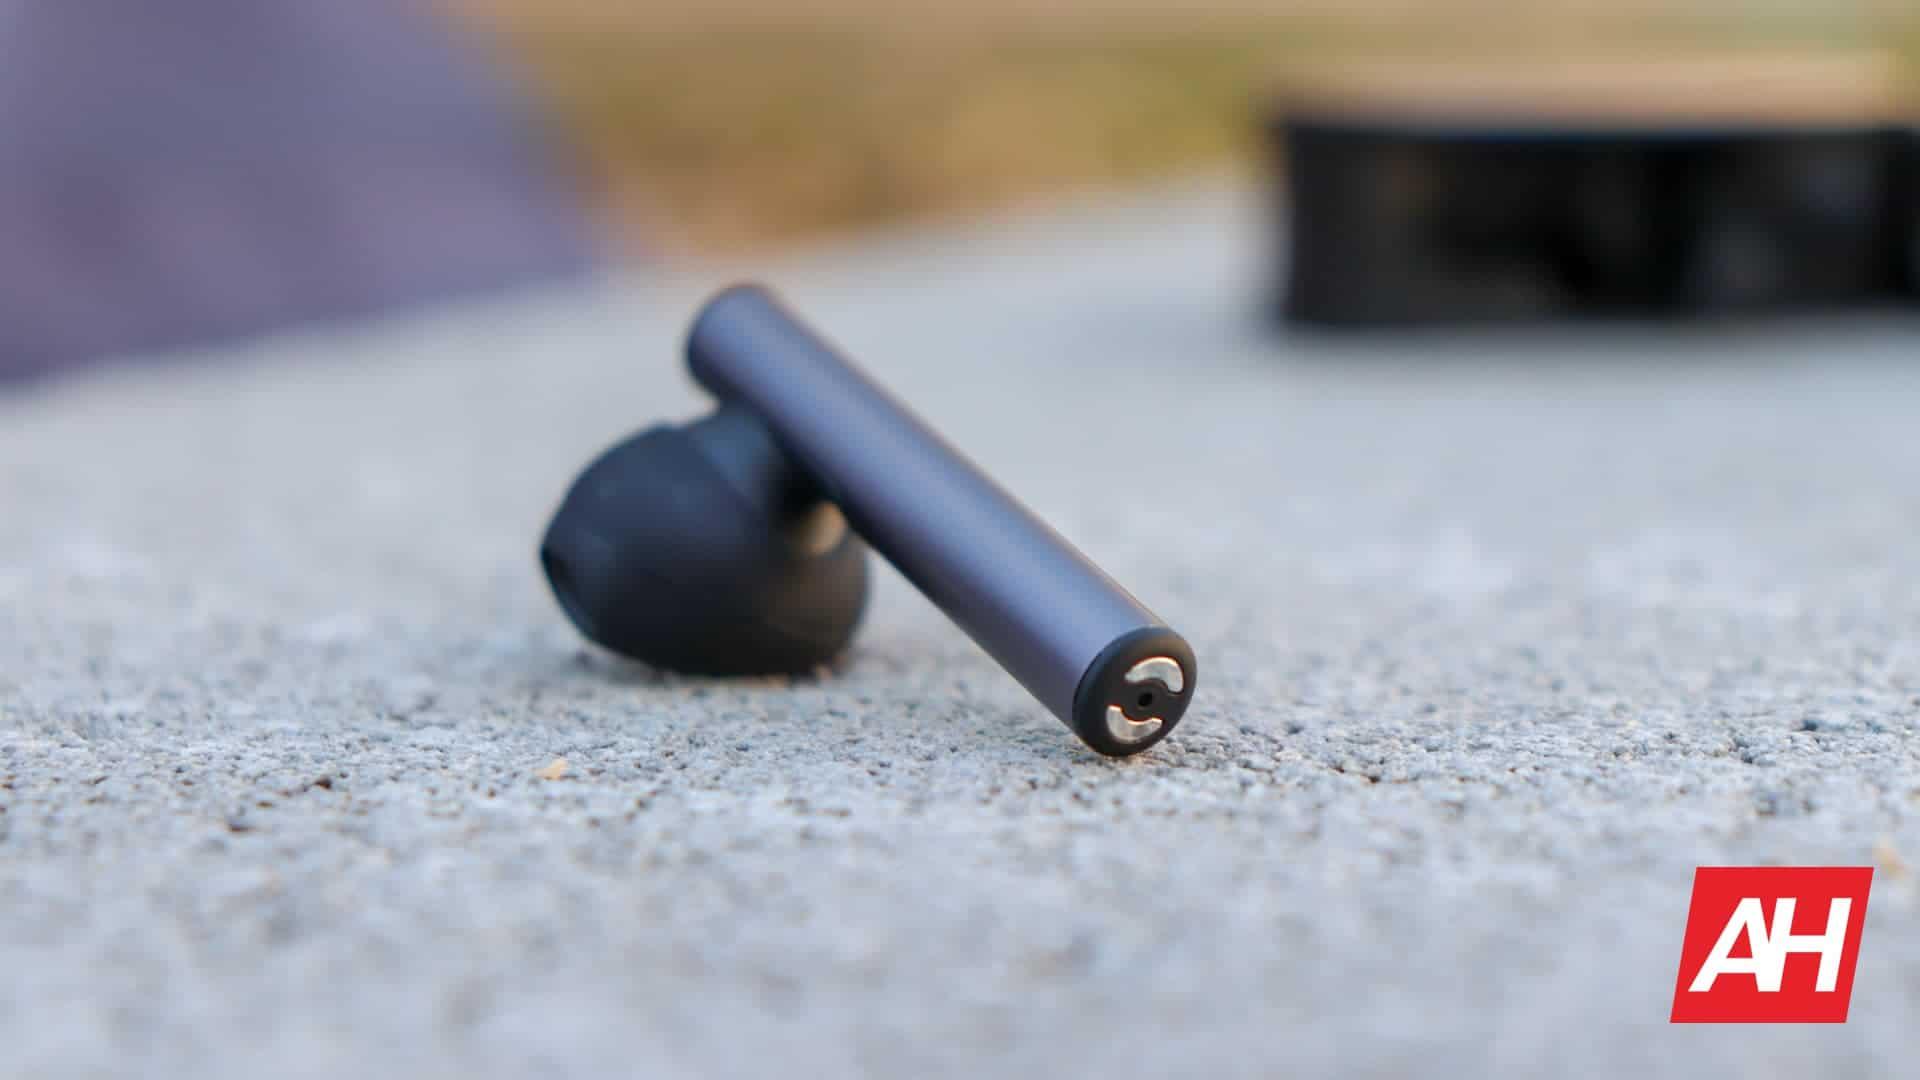 01 7 Oddict Twig Earbuds Hardware Review DG AH 2020